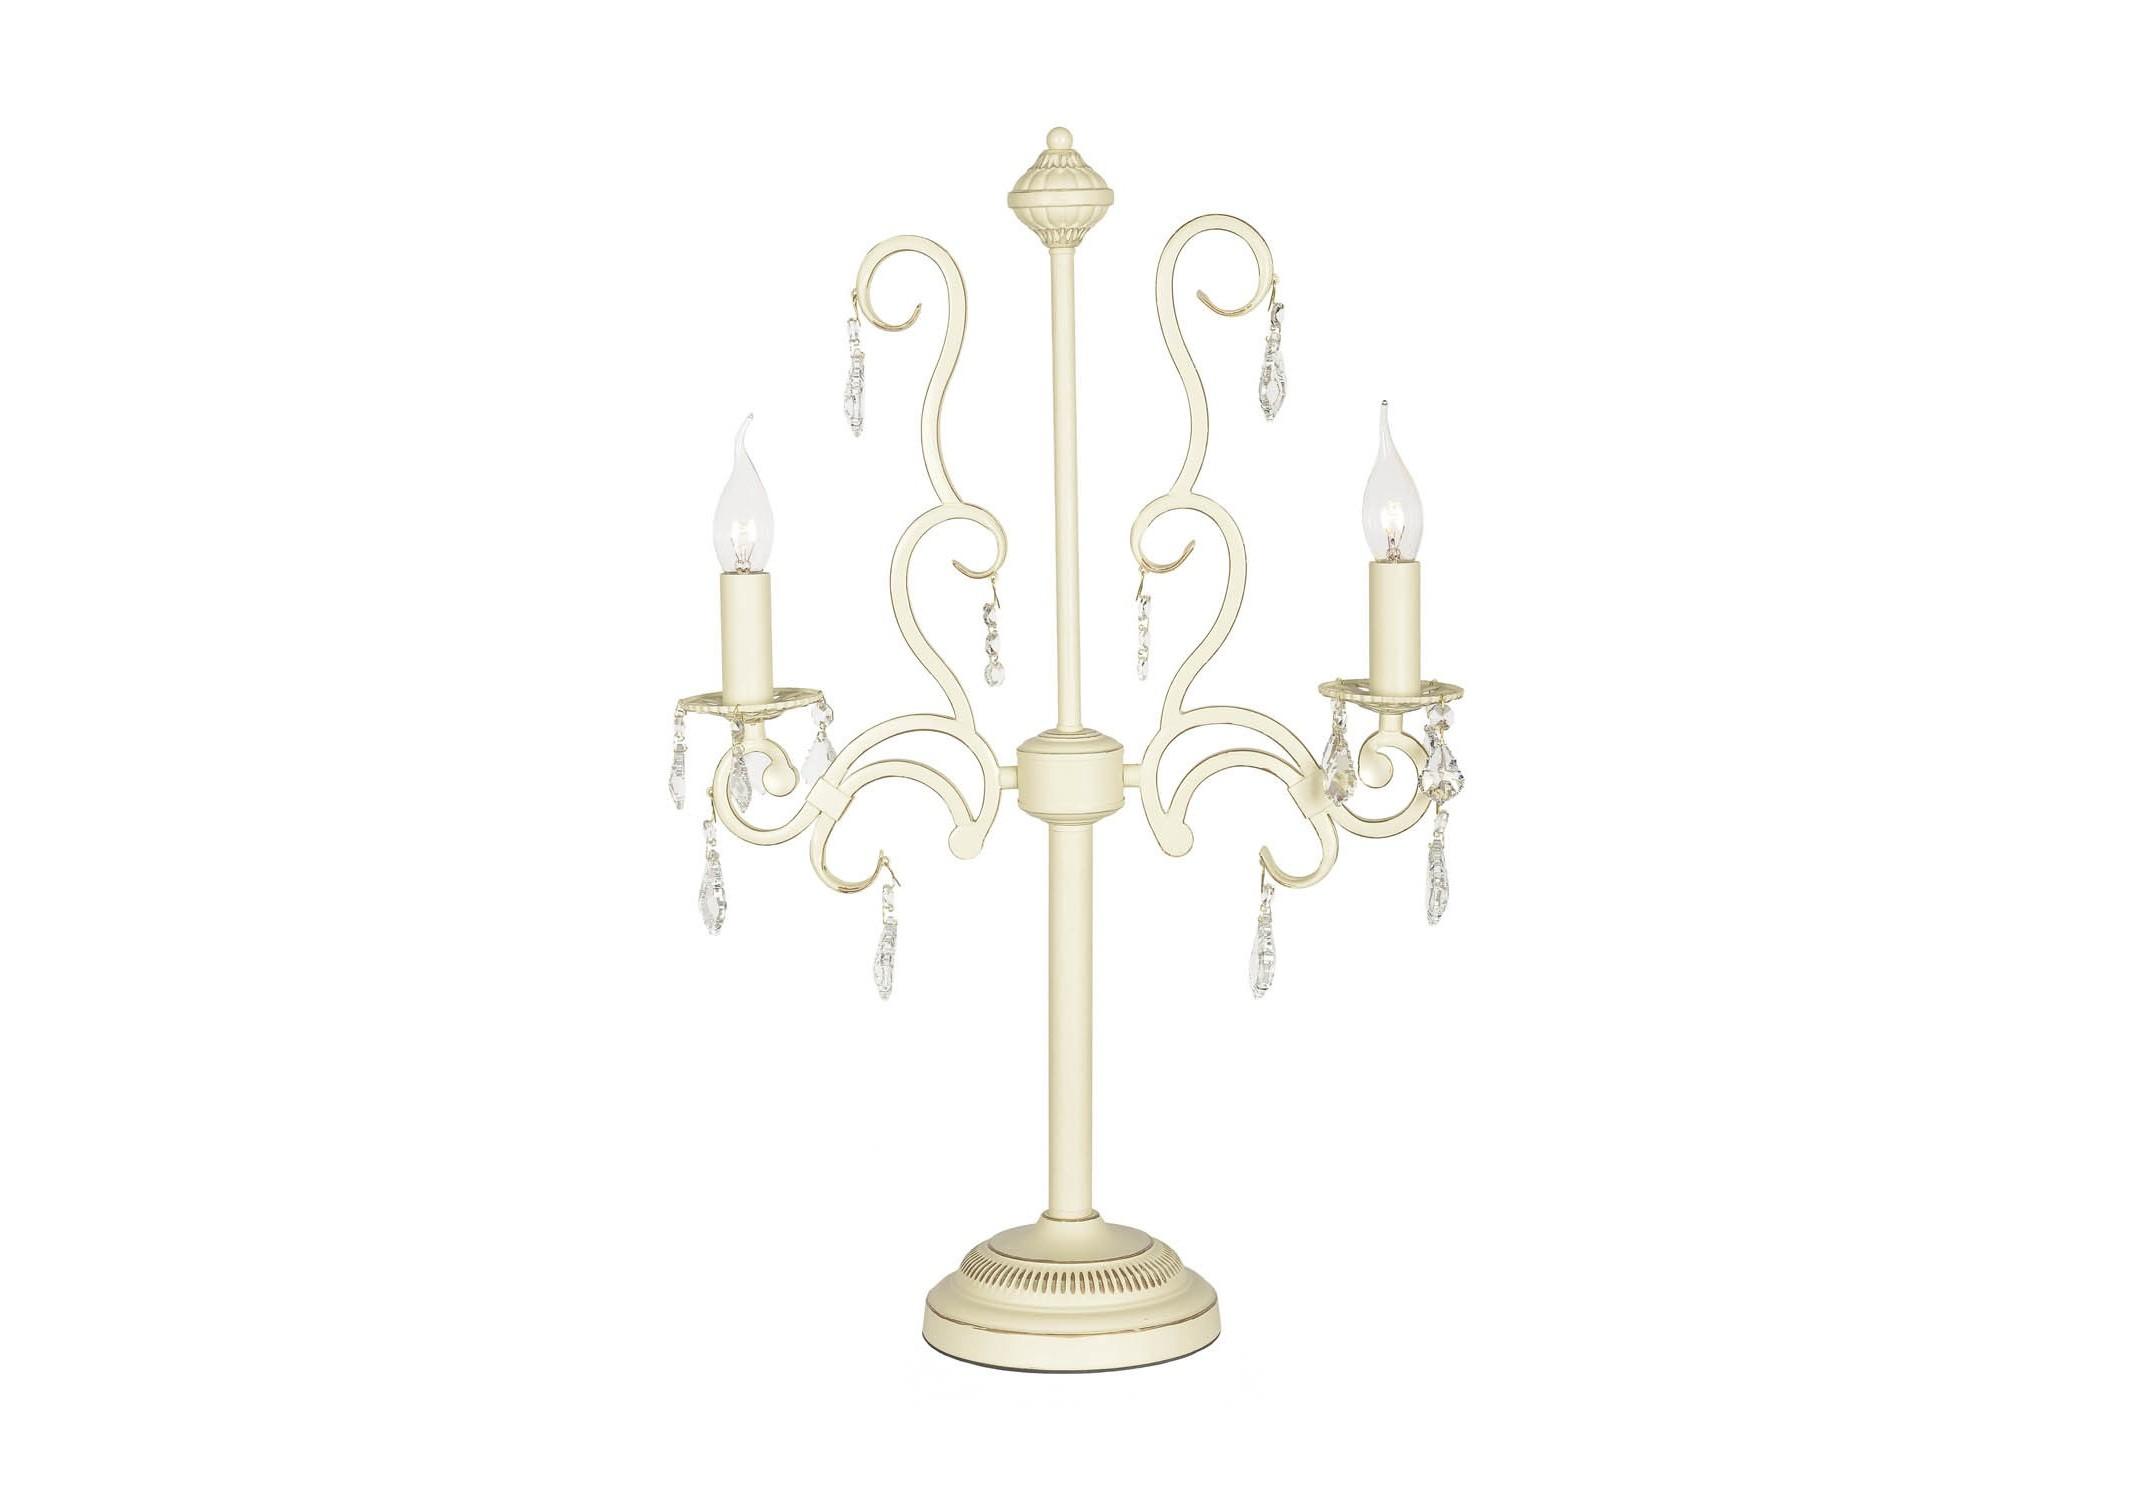 Настольная лампа (arti lampadari) бежевый 70.0 см. фото